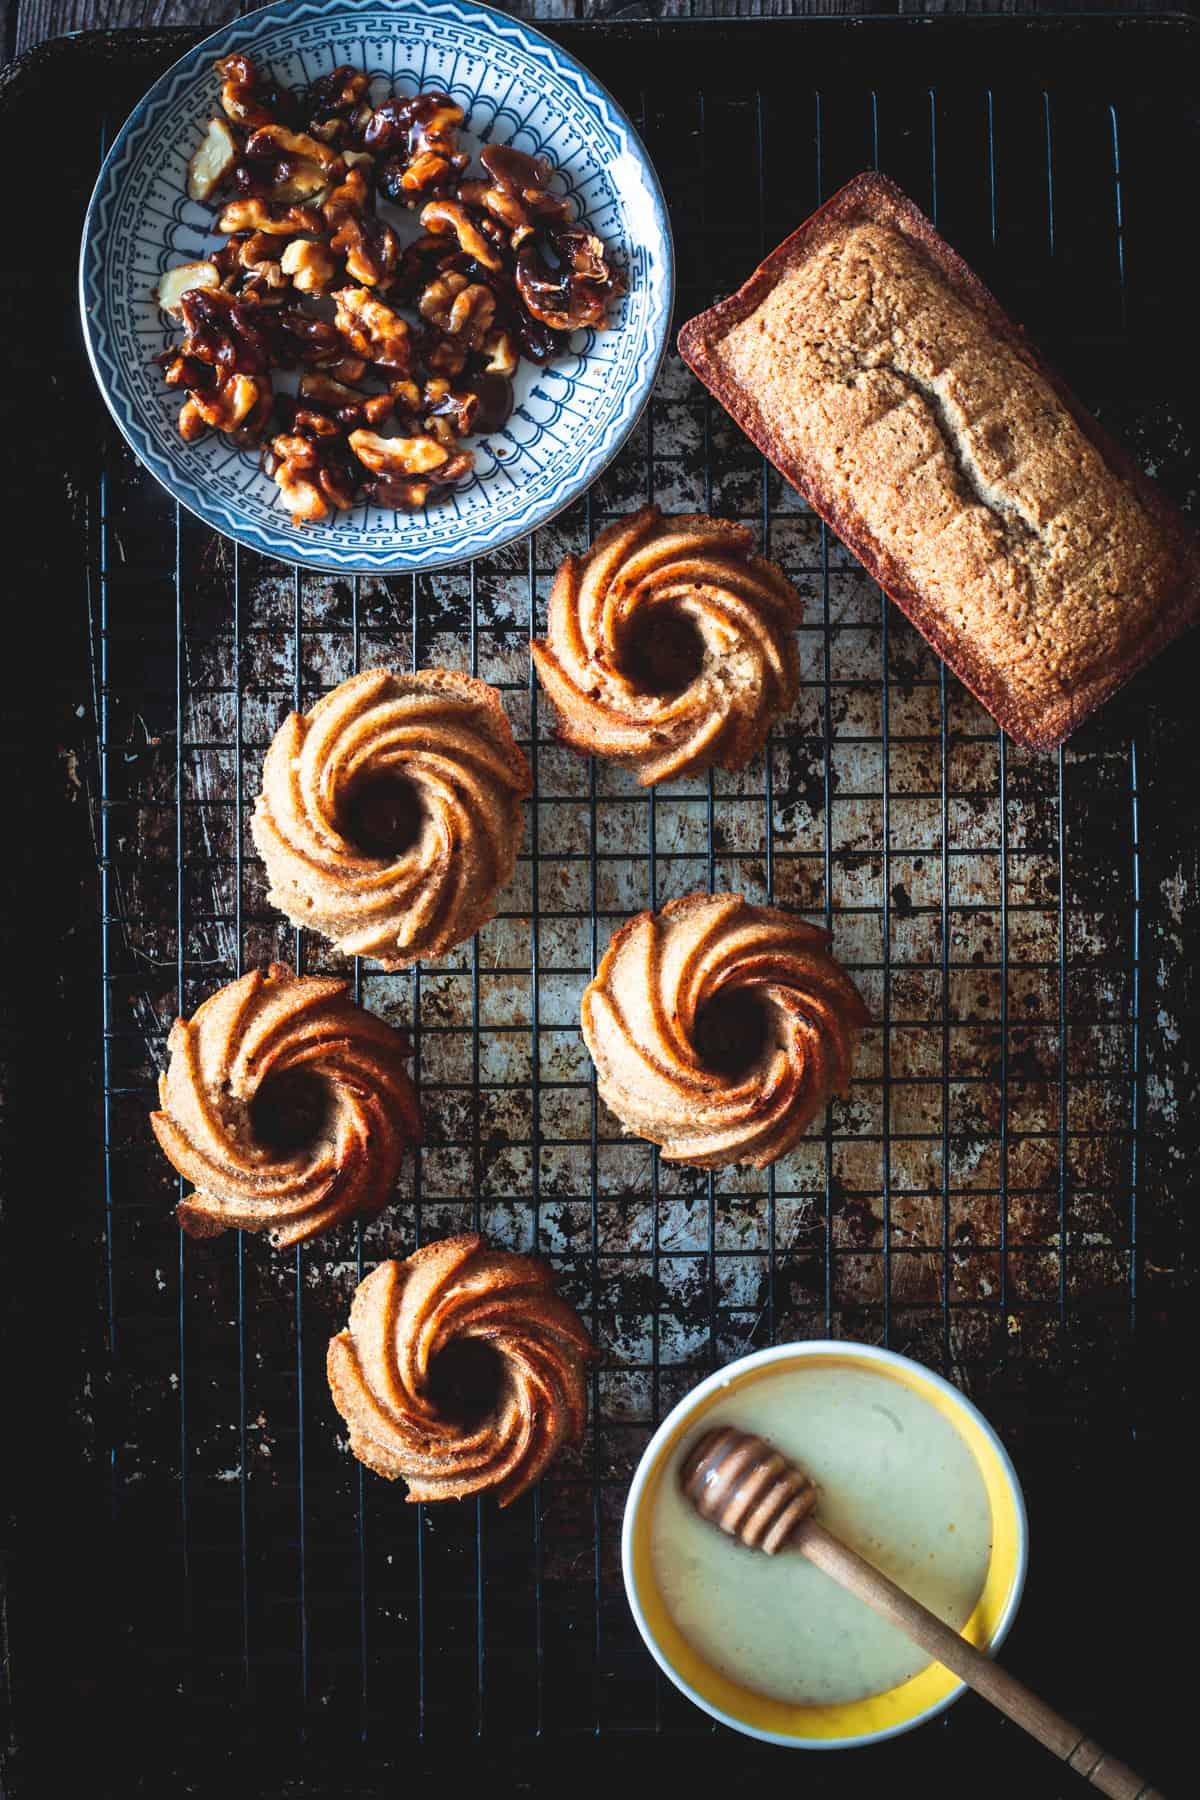 mini gluten free honey cakes with glaze and walnuts